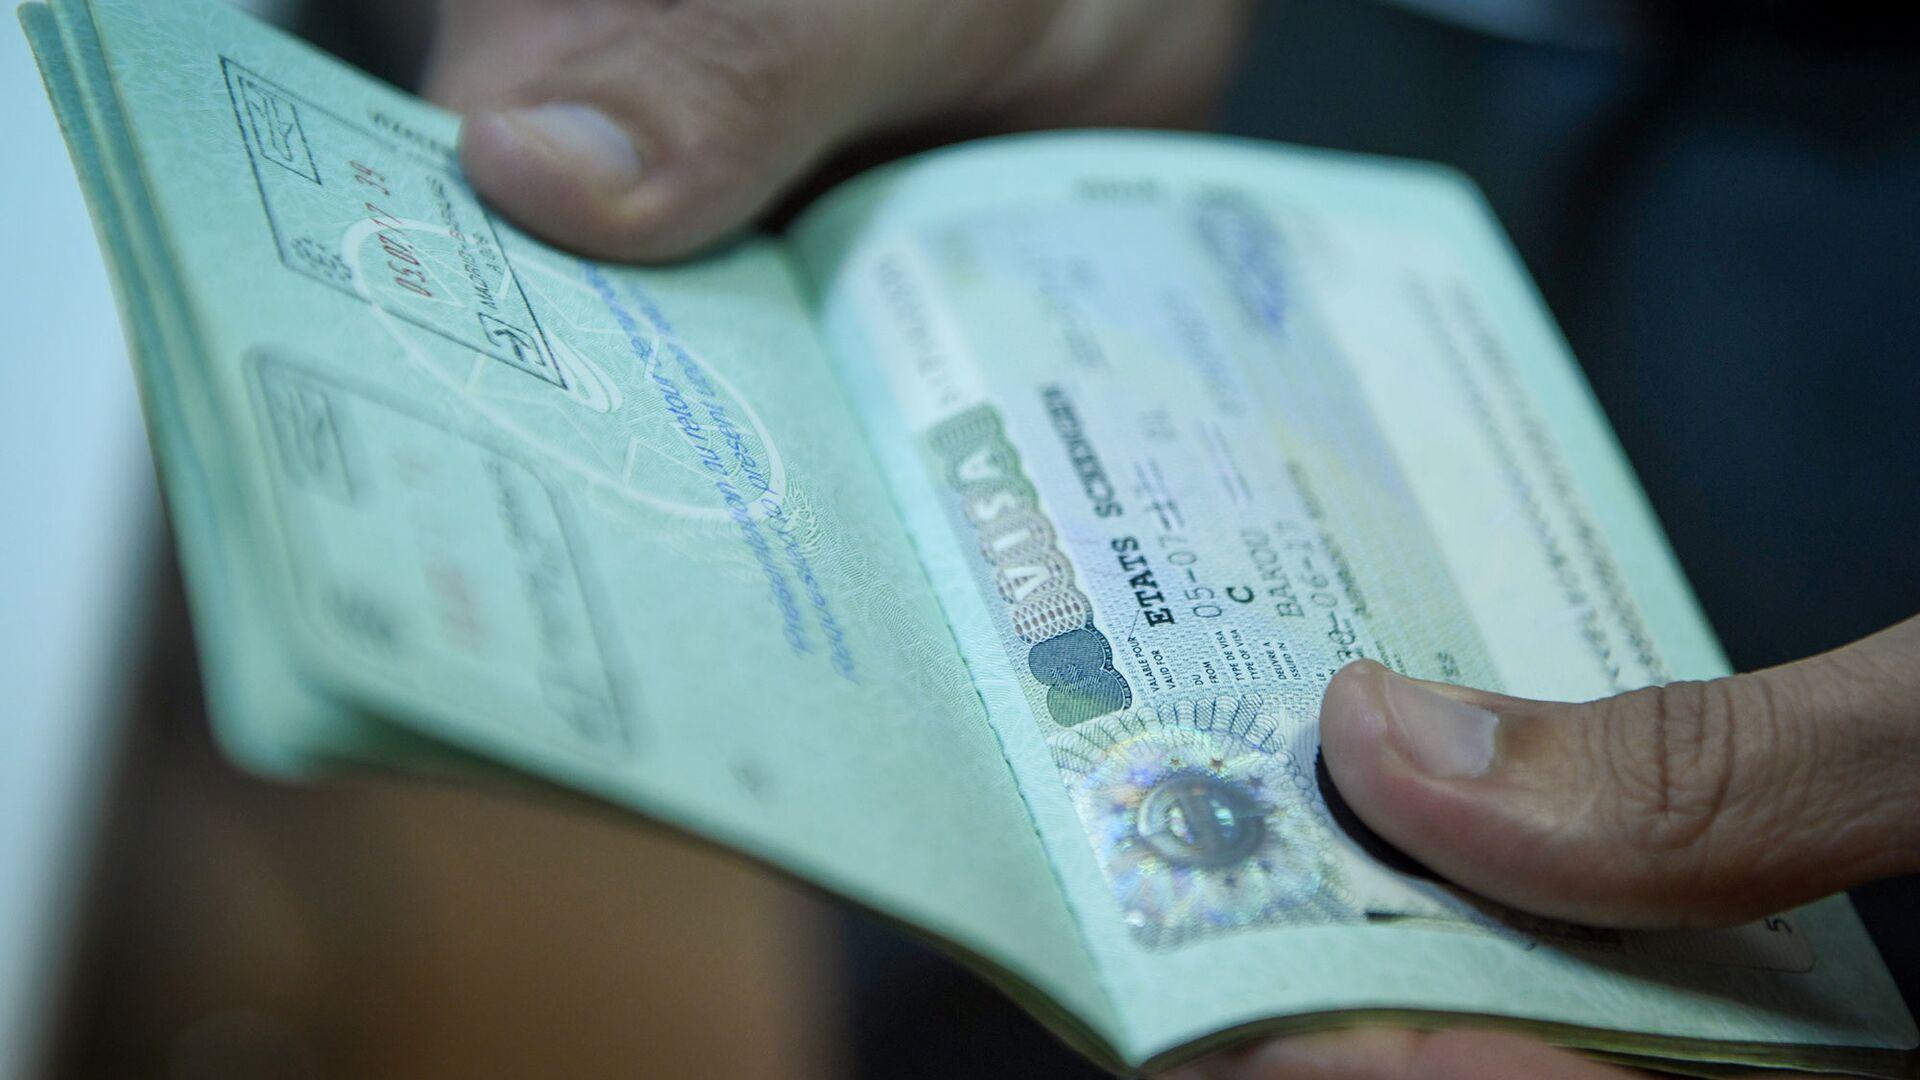 Виза в паспорте гражданина Азербайджана, фото из архива - Sputnik Азербайджан, 1920, 01.02.2021